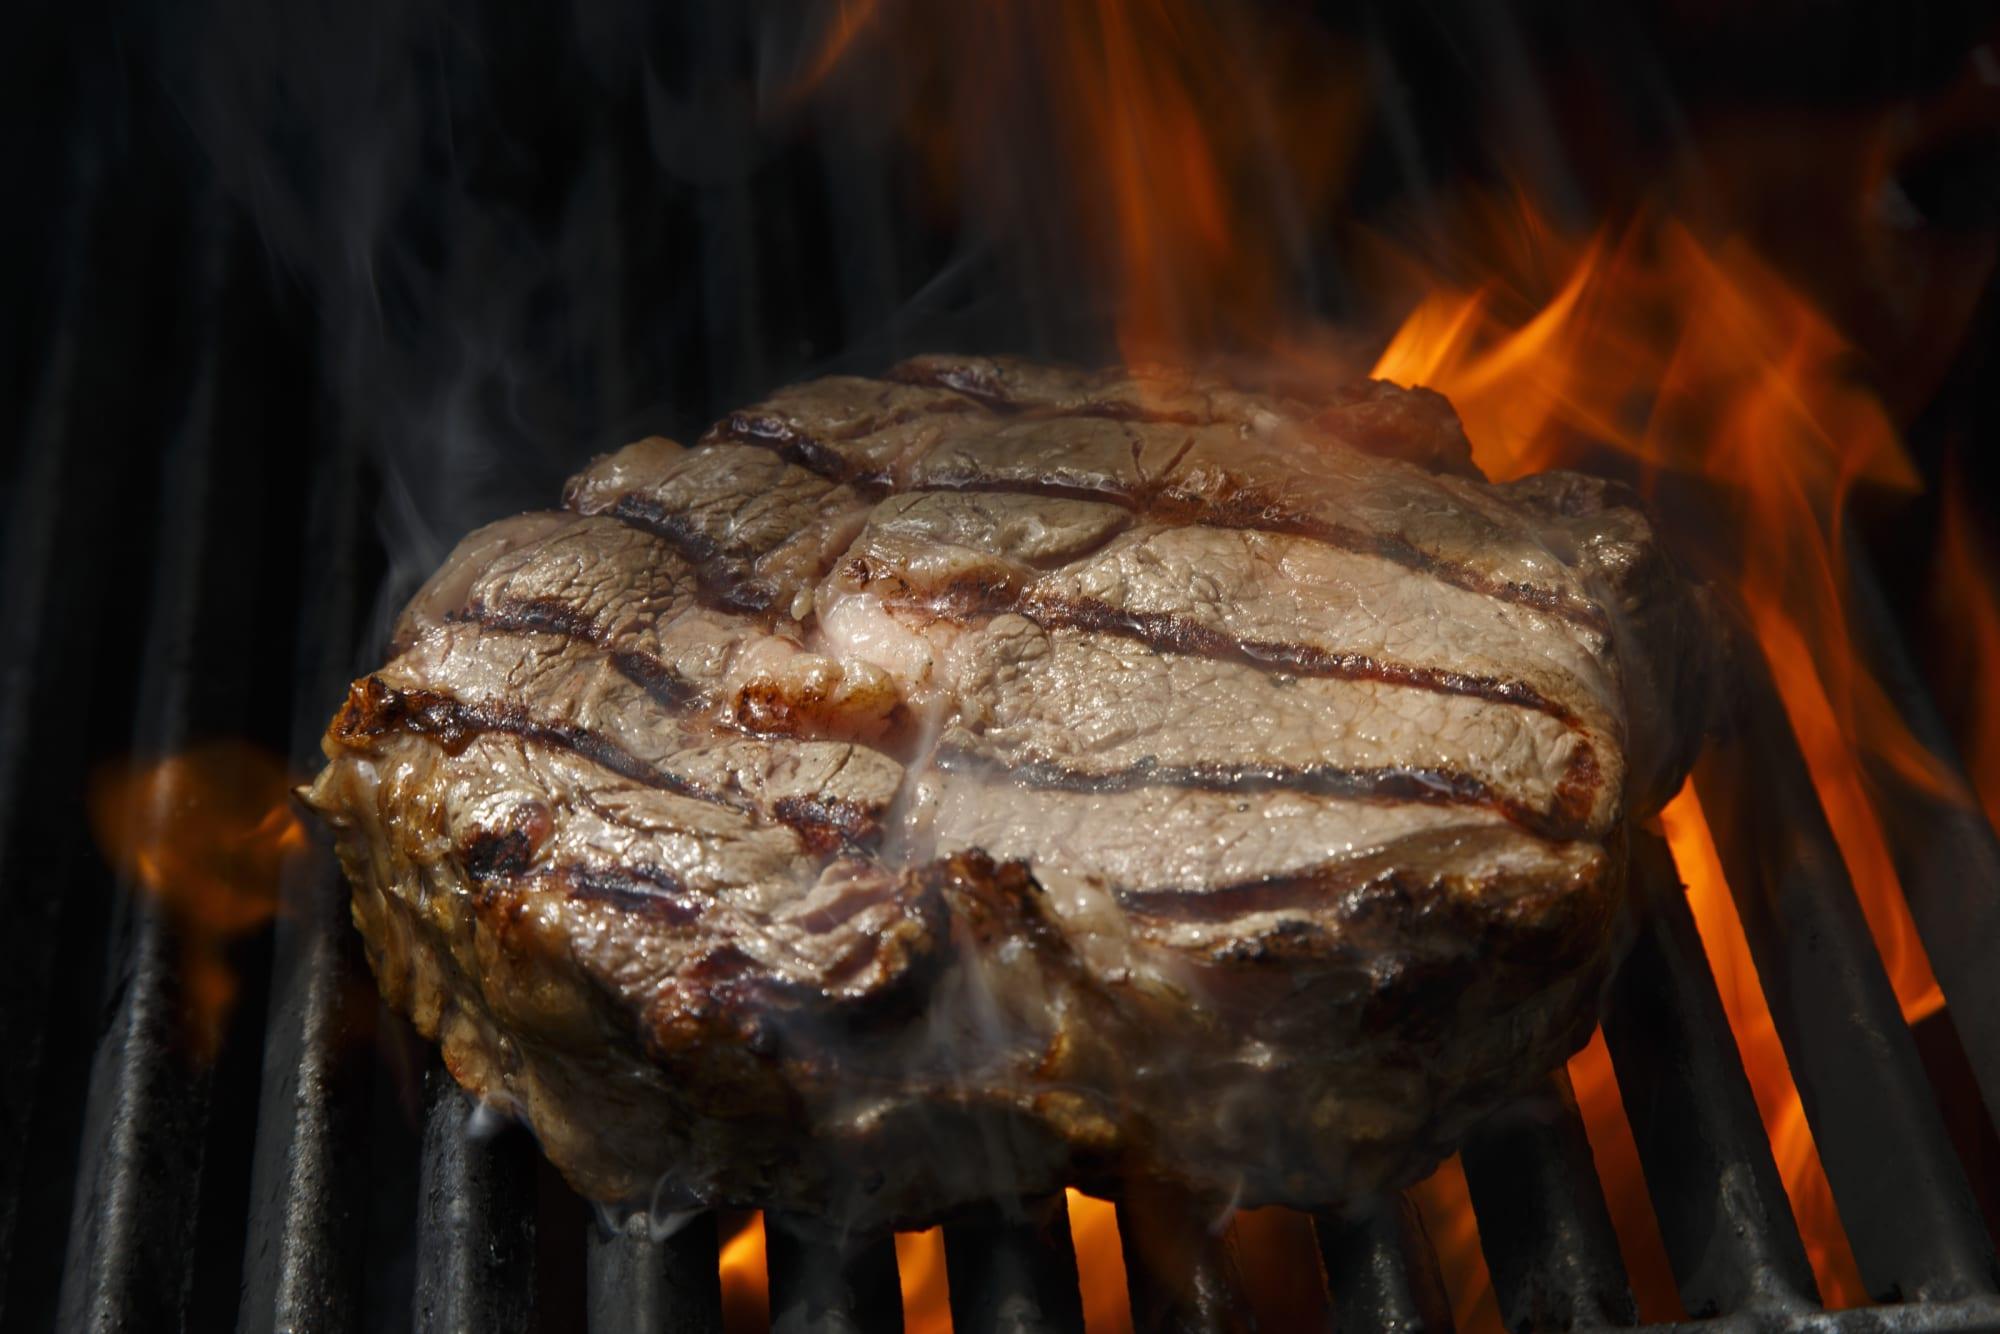 Steak sauce makes grilled steak sizzle